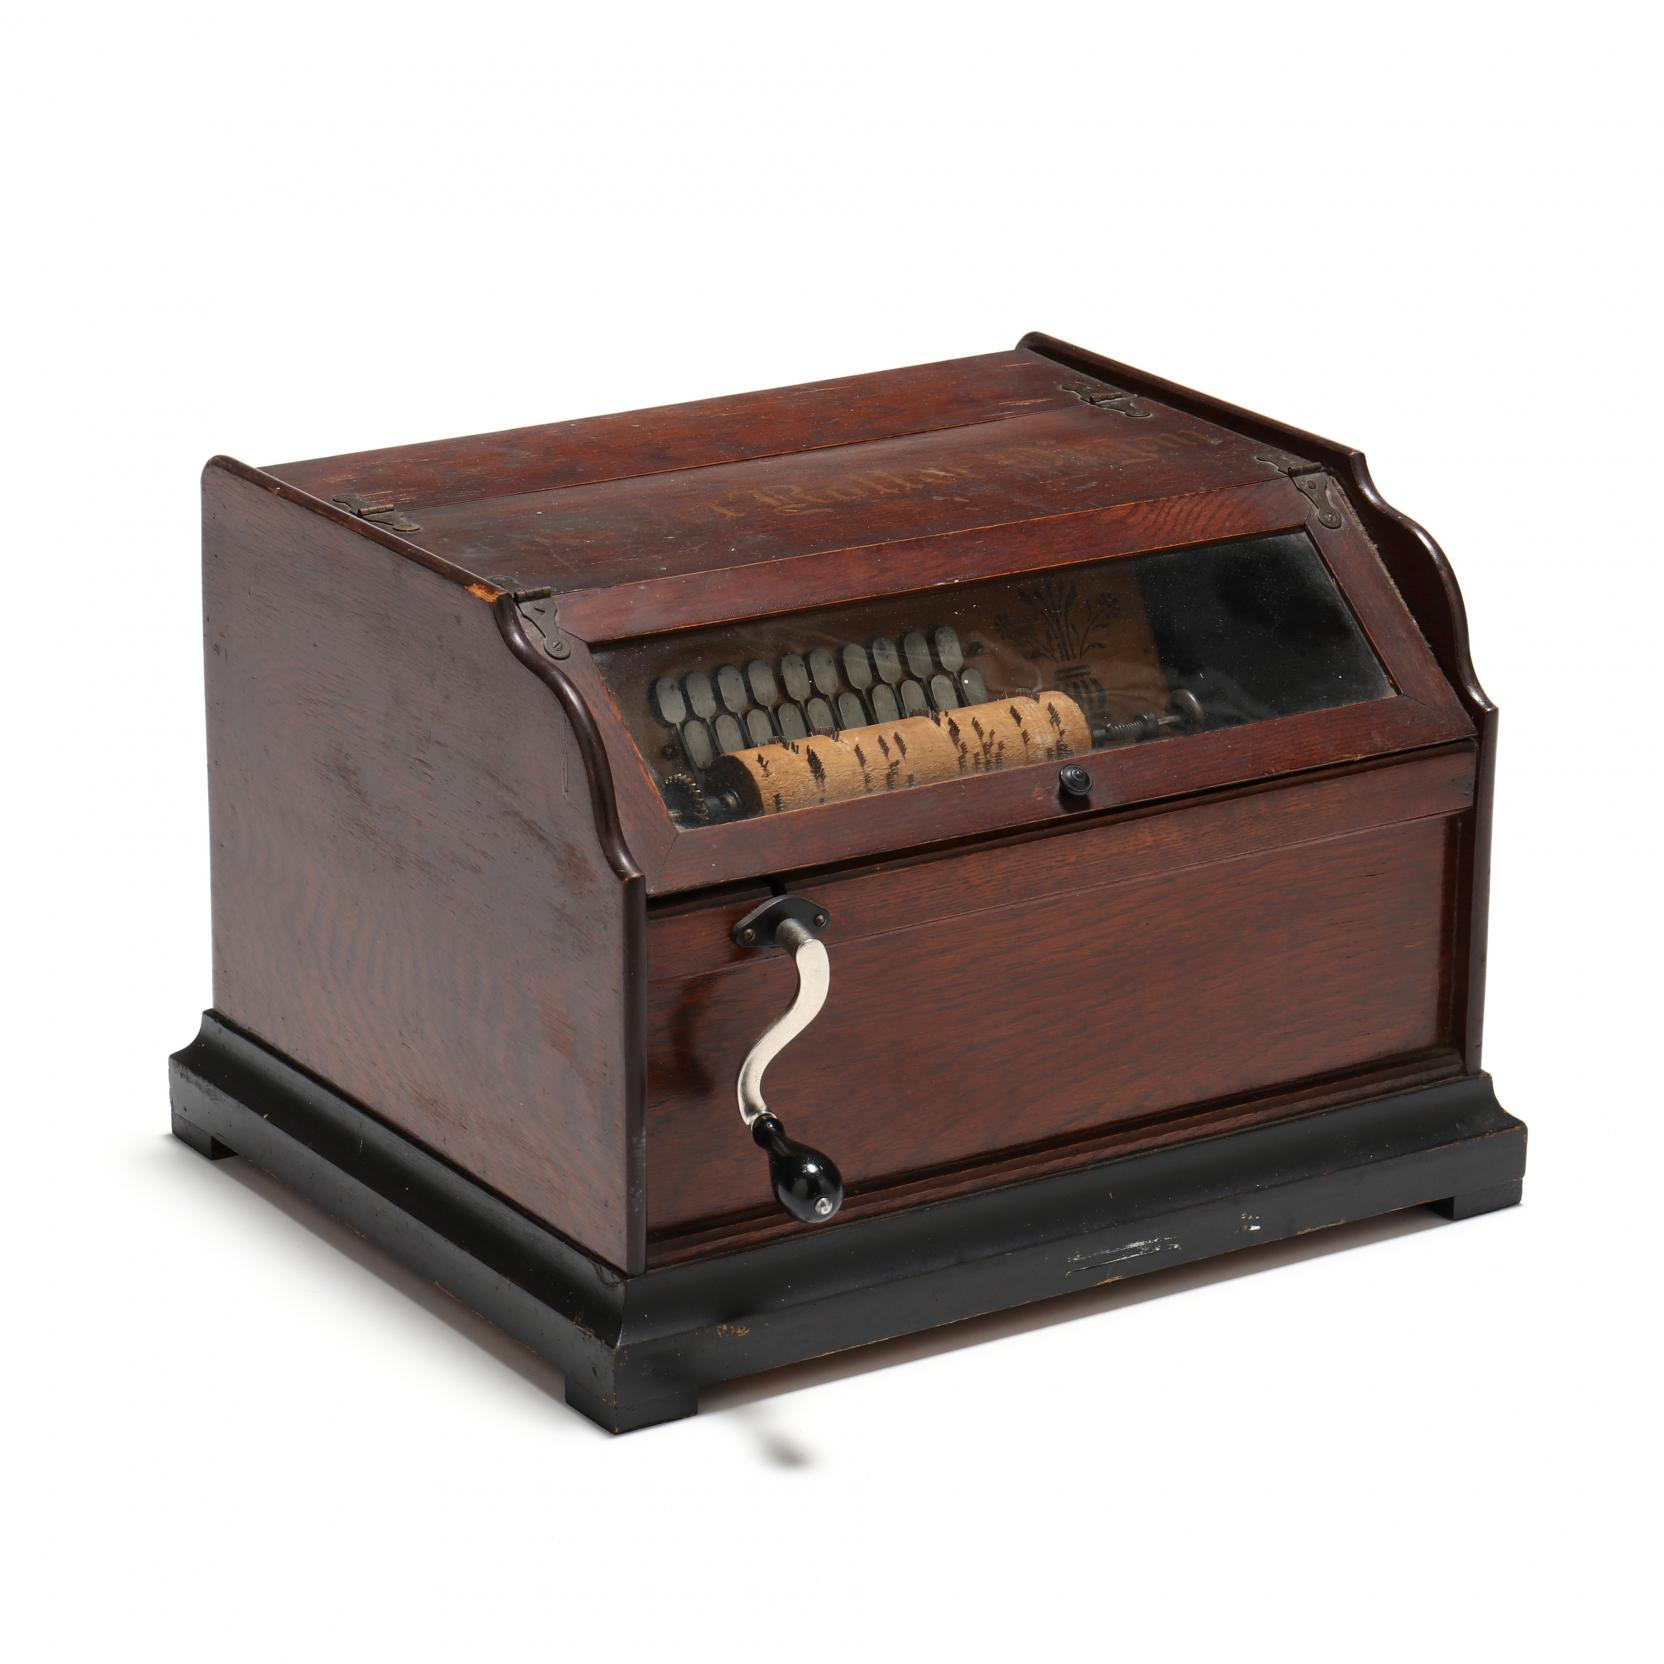 concert-roller-organ